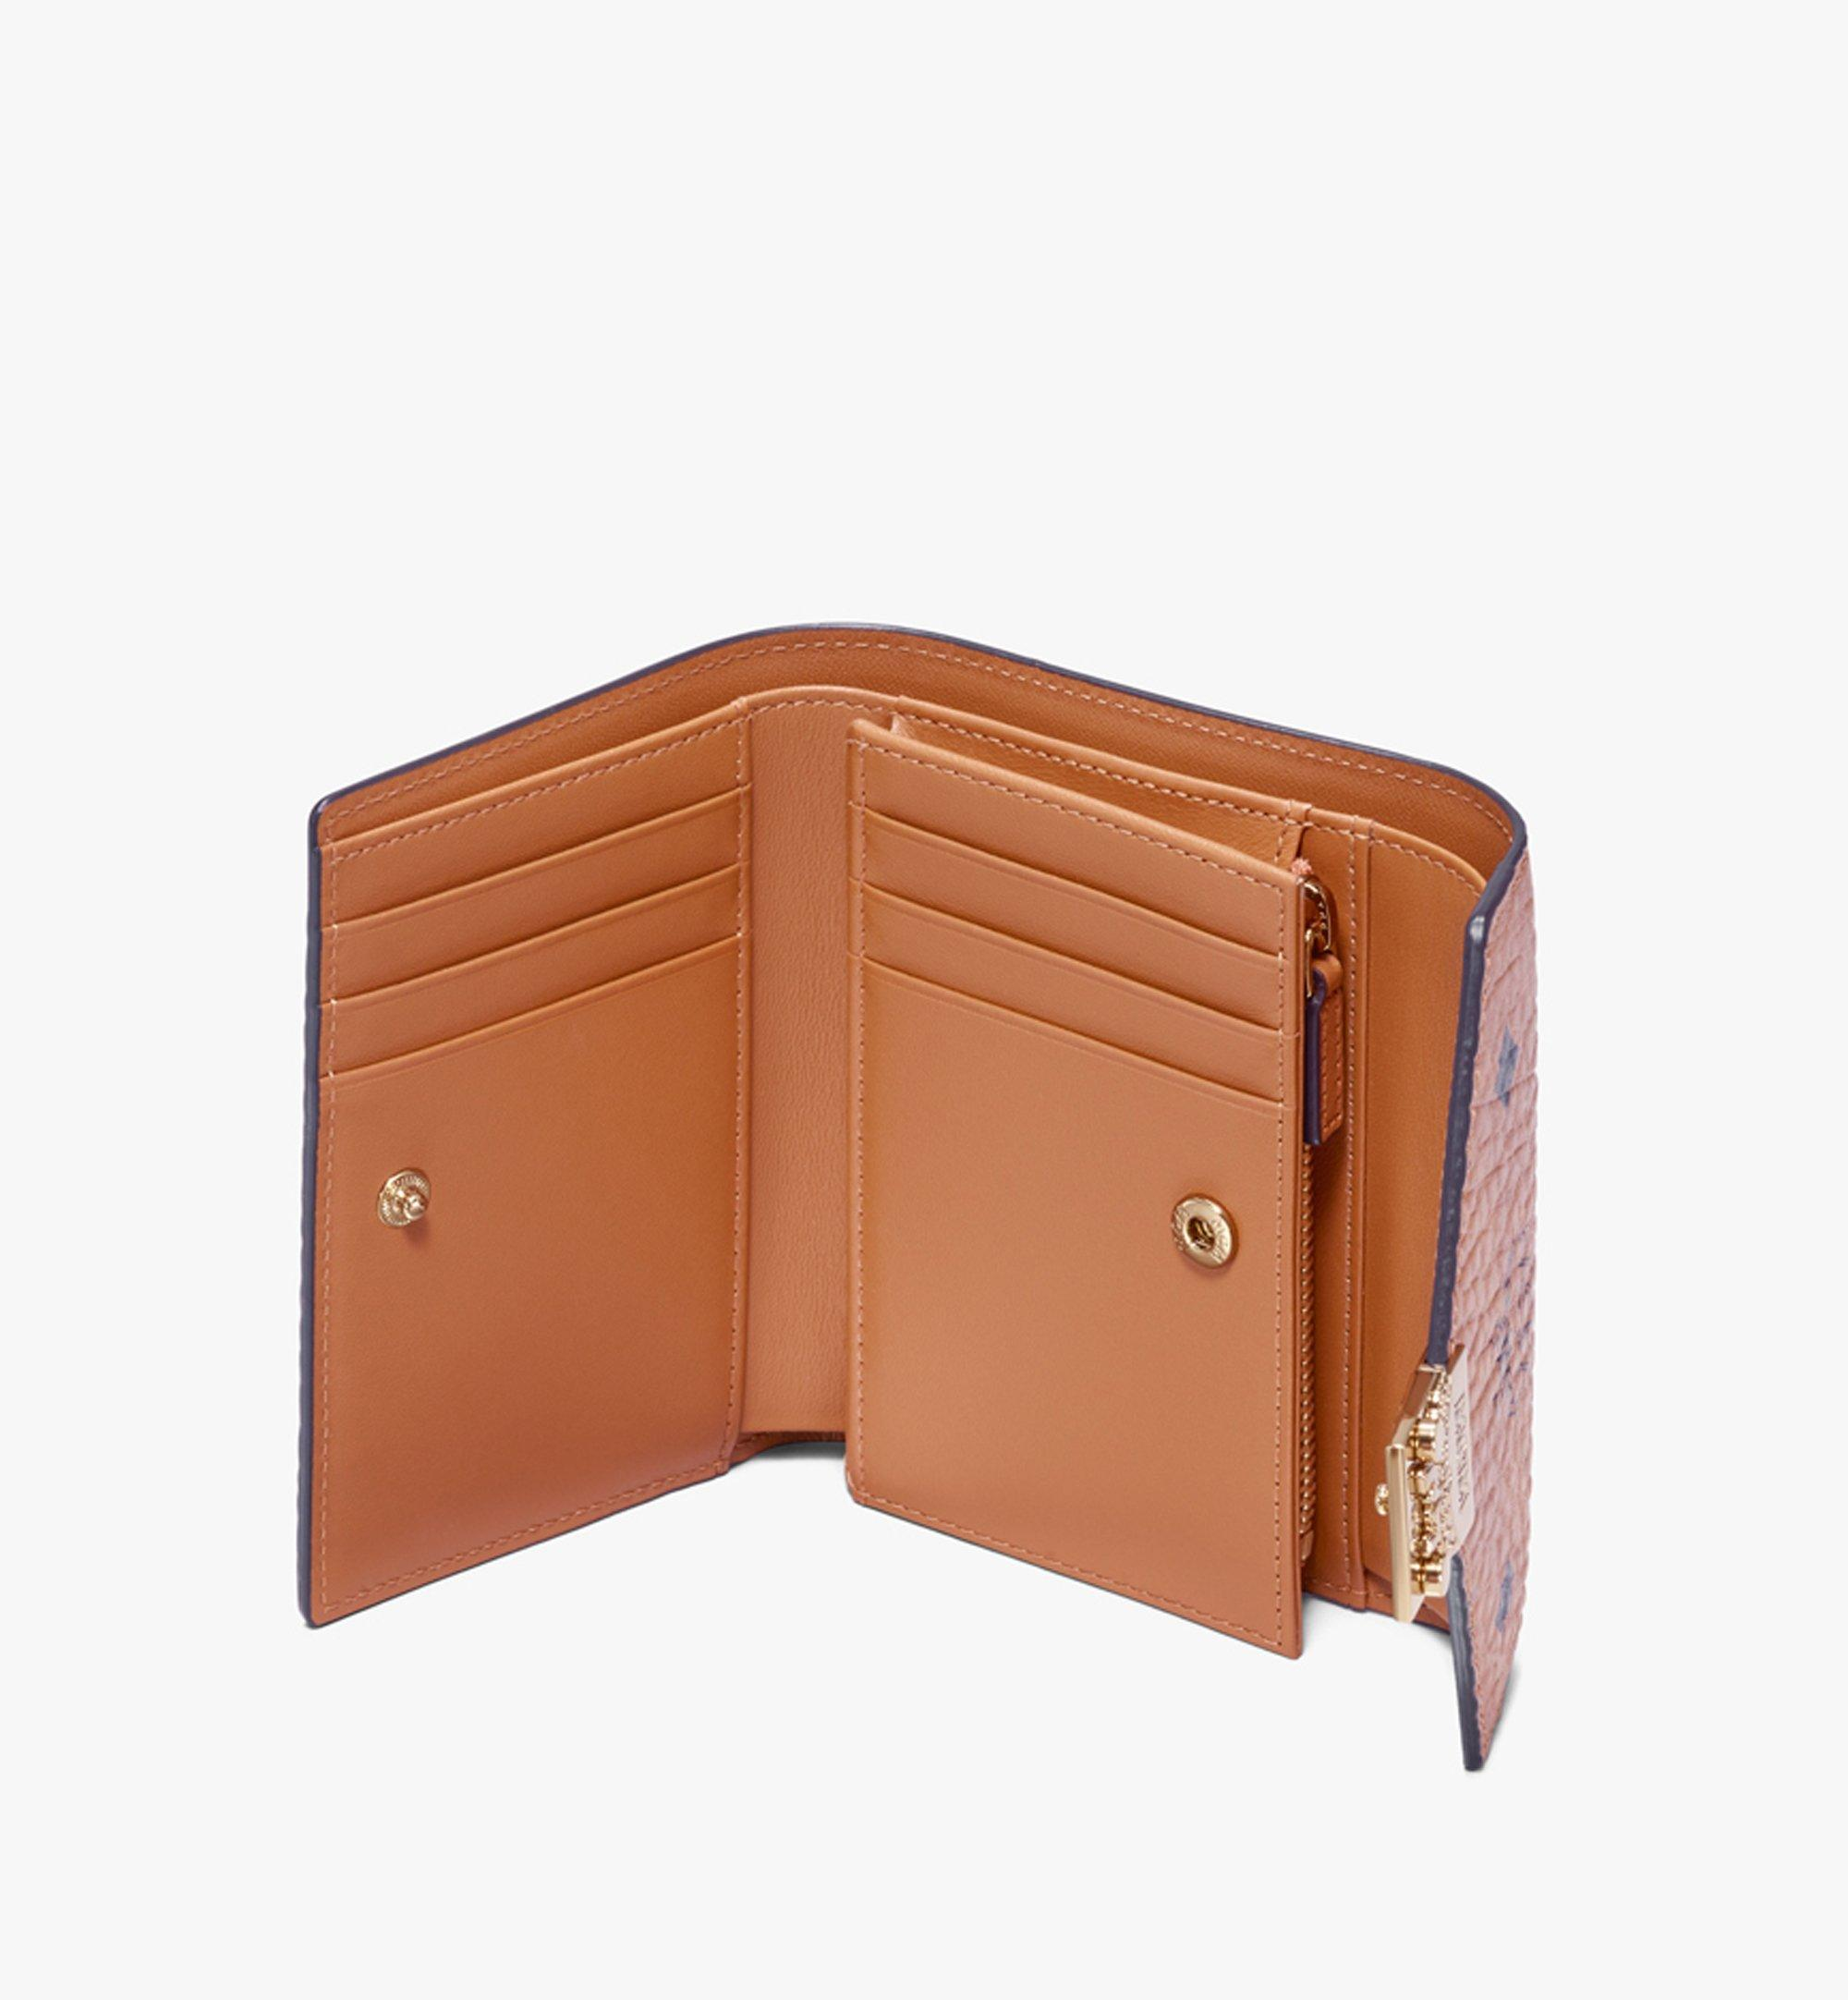 MCM Patricia Three-Fold Wallet in Visetos Cognac MYS9APA13CO001 Alternate View 2